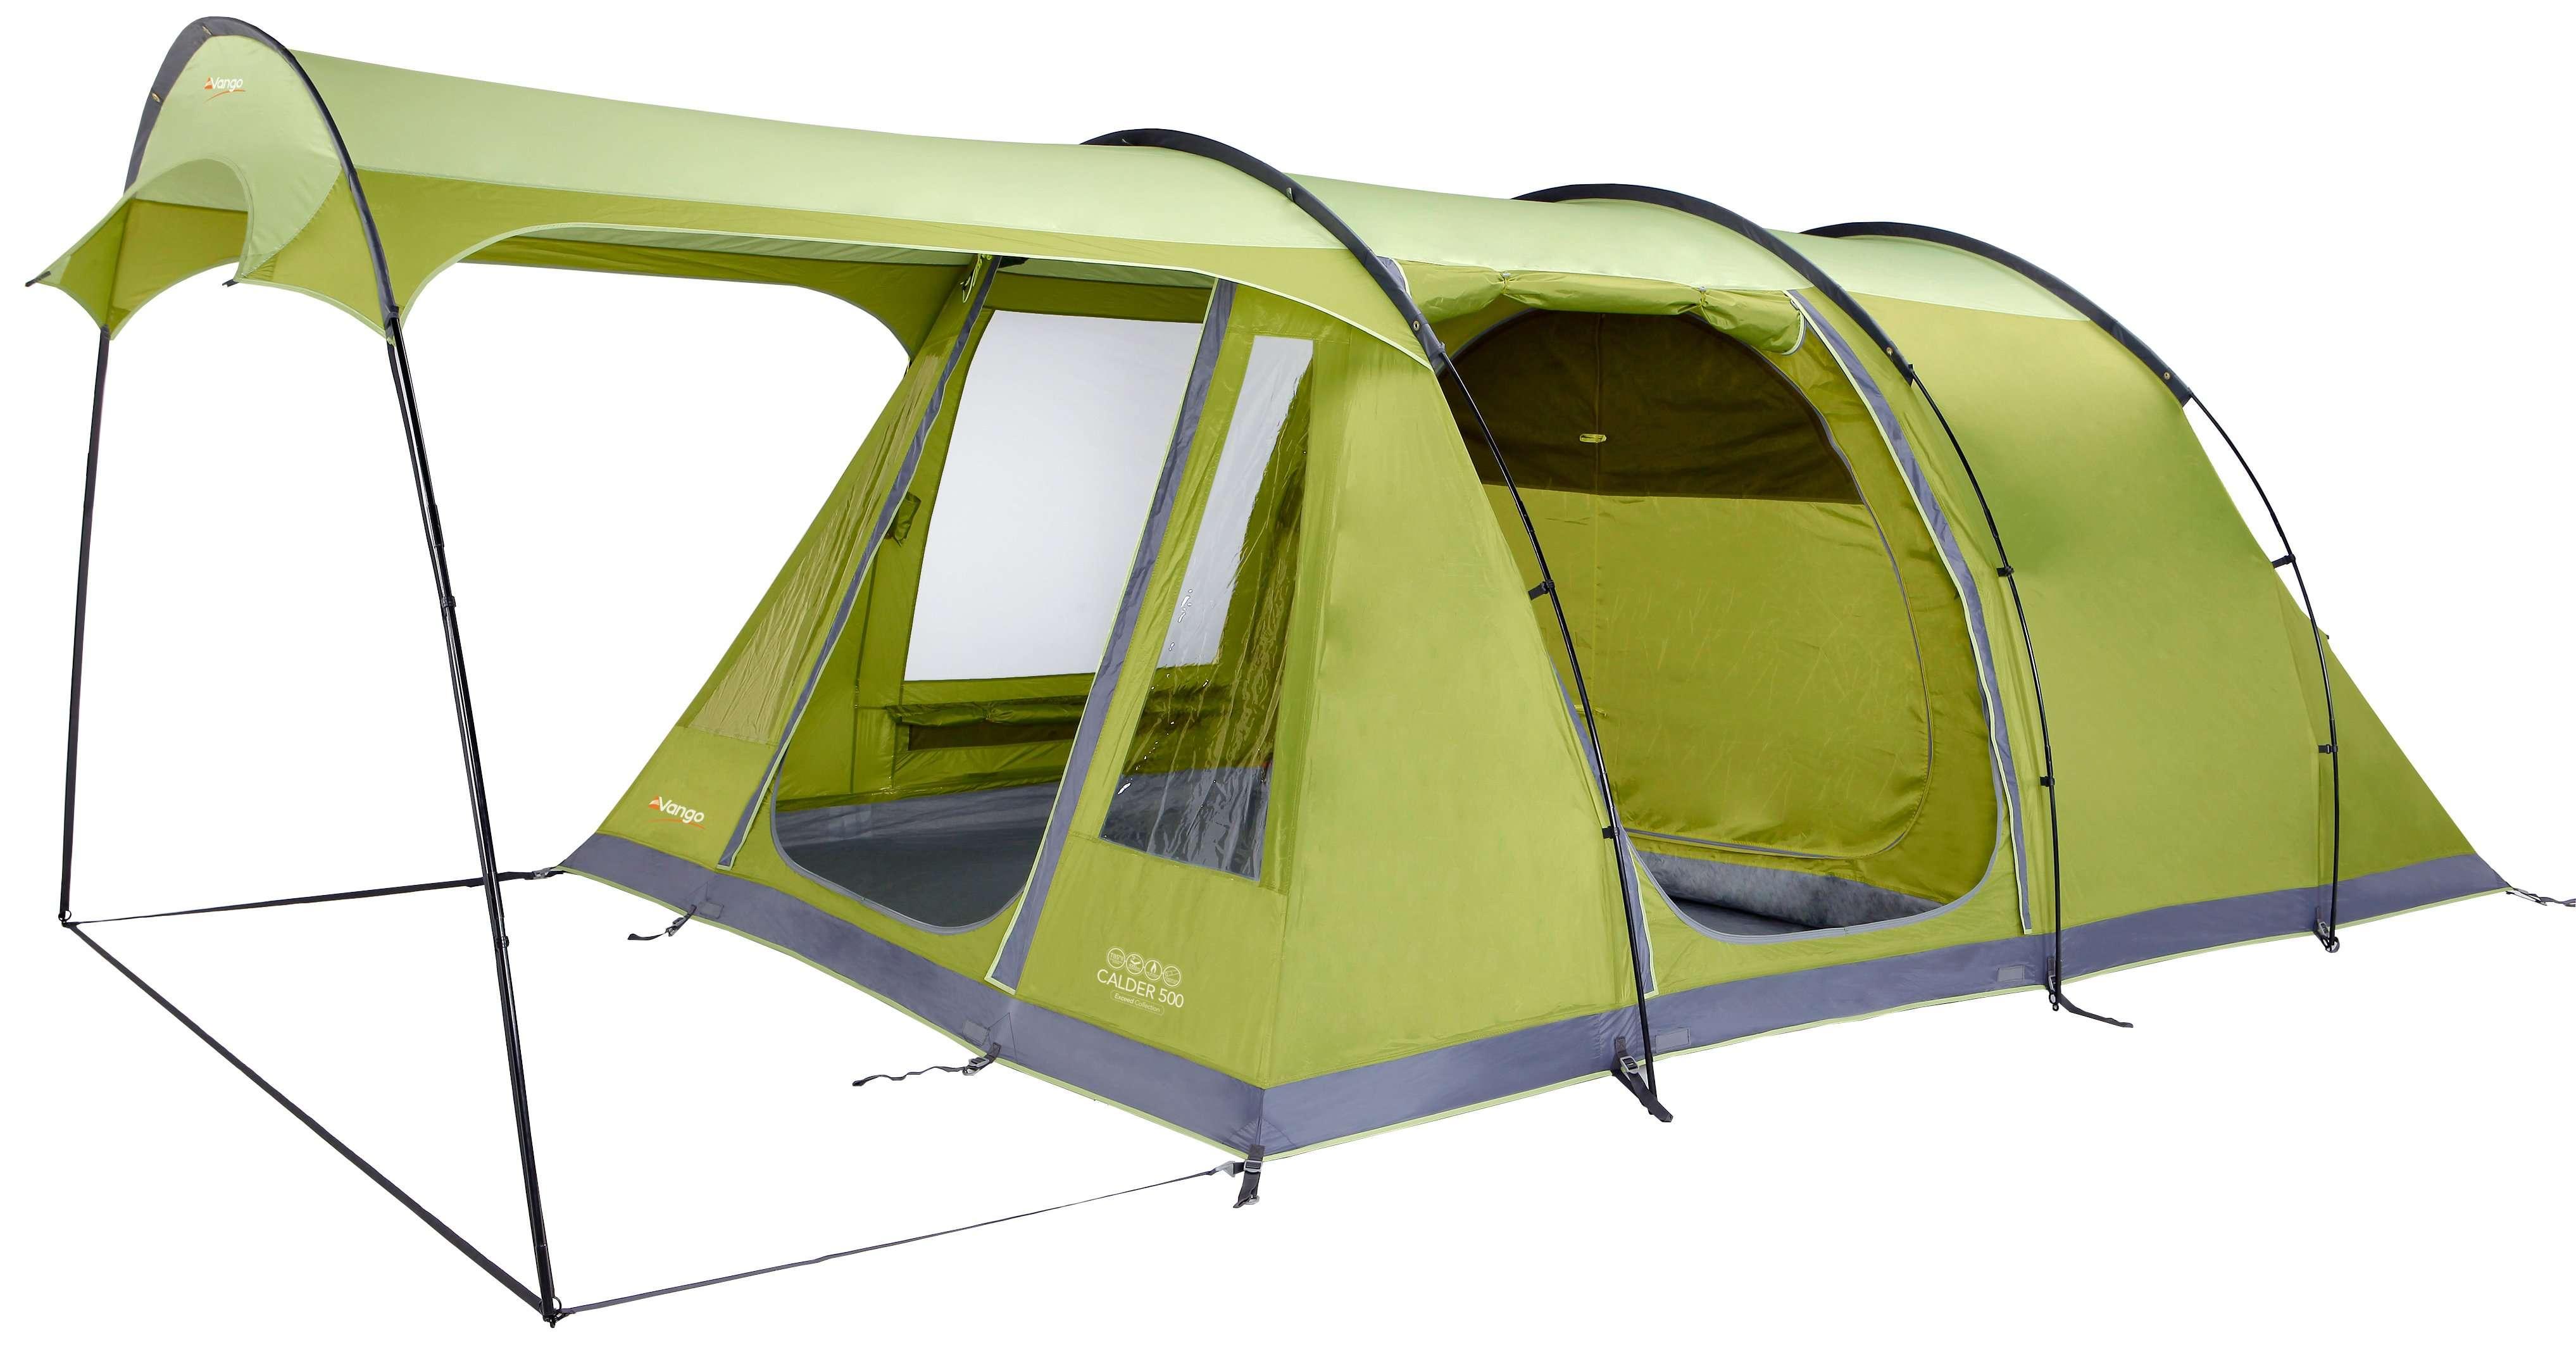 VANGO Calder 500 Family Tent